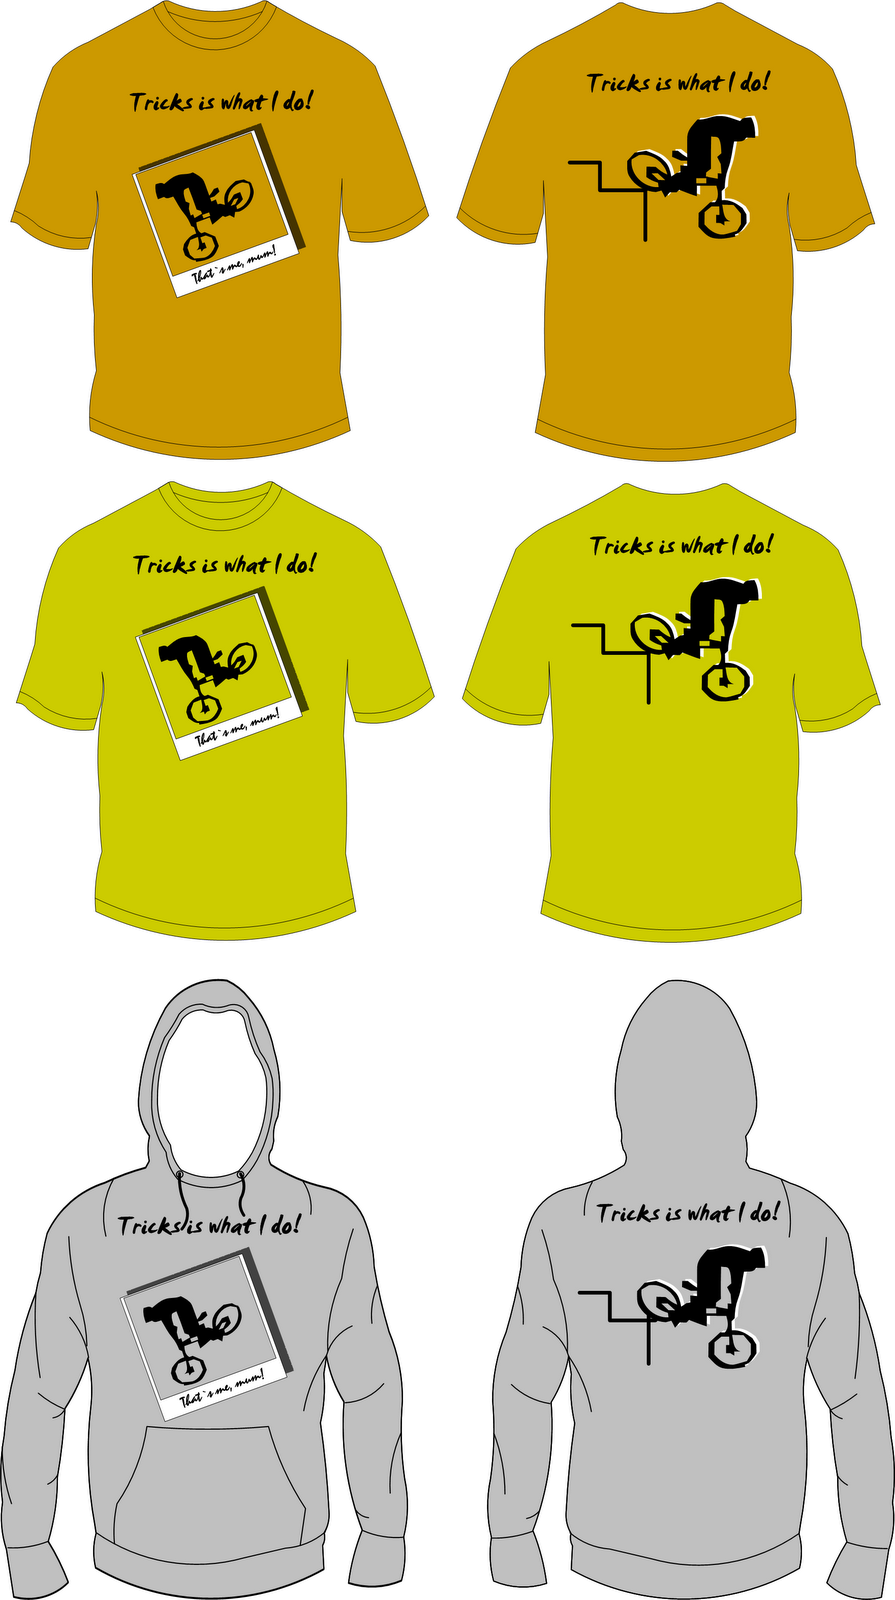 e000645c1 t-shirt-printing-design.html in hitizexyt.github.com